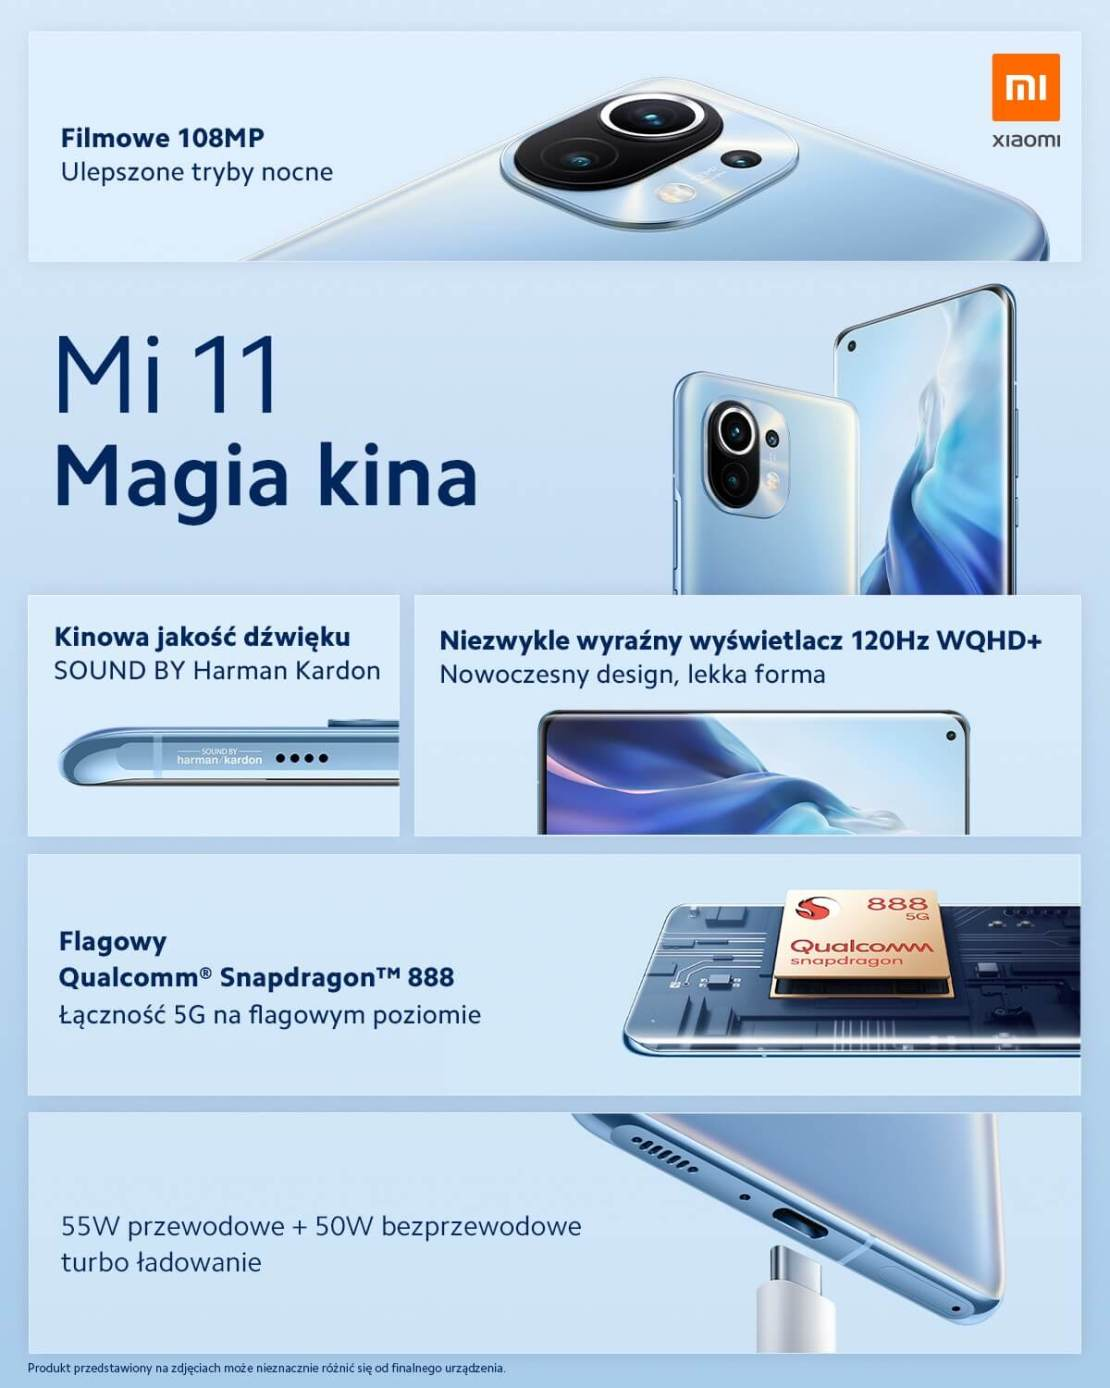 Xiaomi Mi 11 - Magia kina